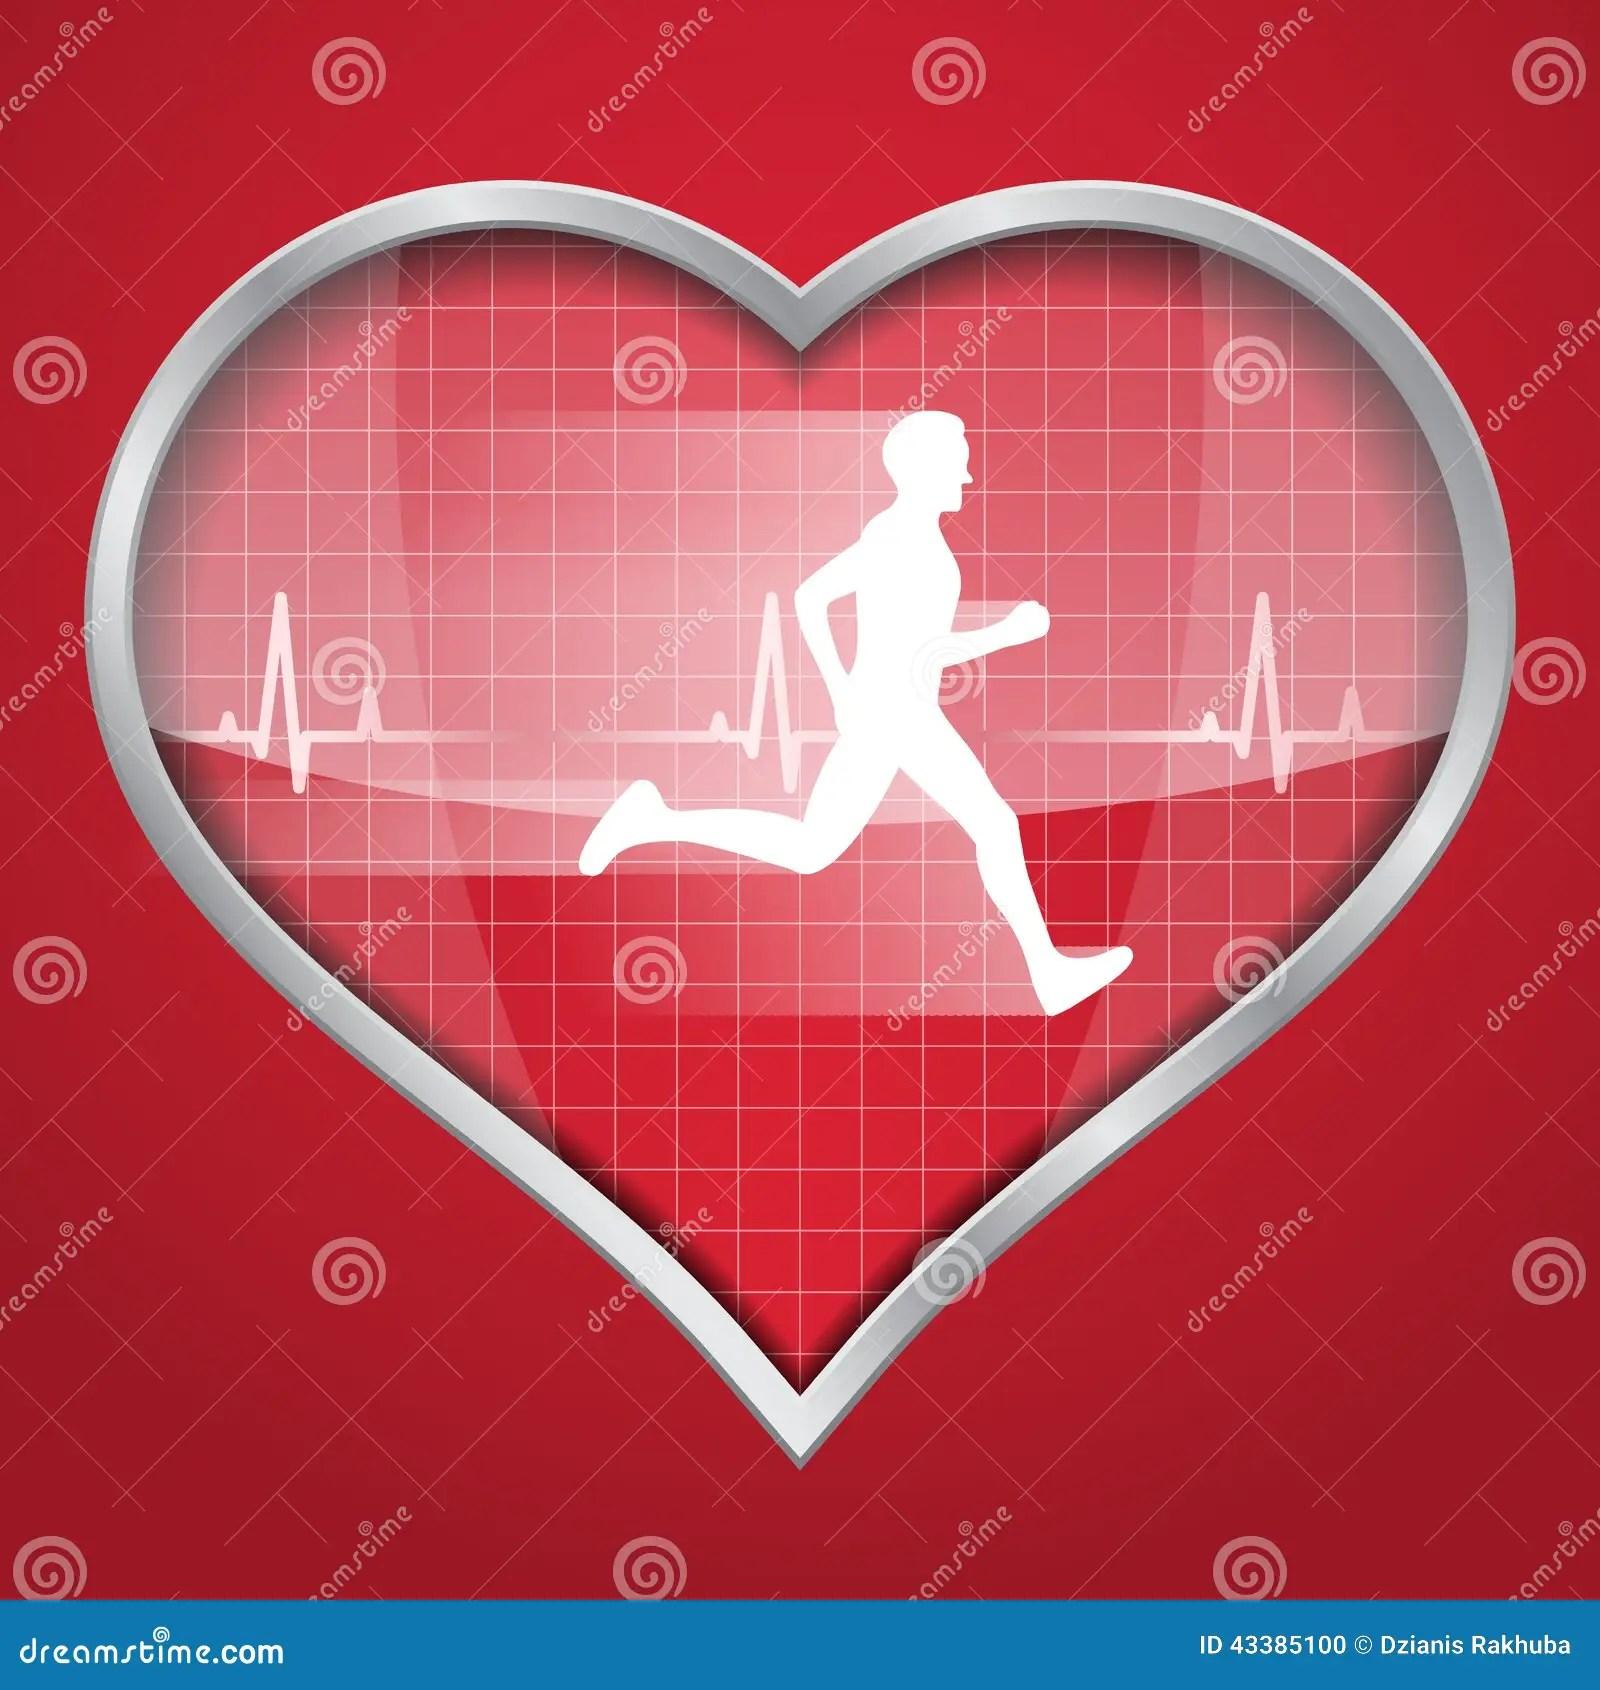 heart diagram inside 7 blade trailer wiring life line a shape stock photo cartoondealer